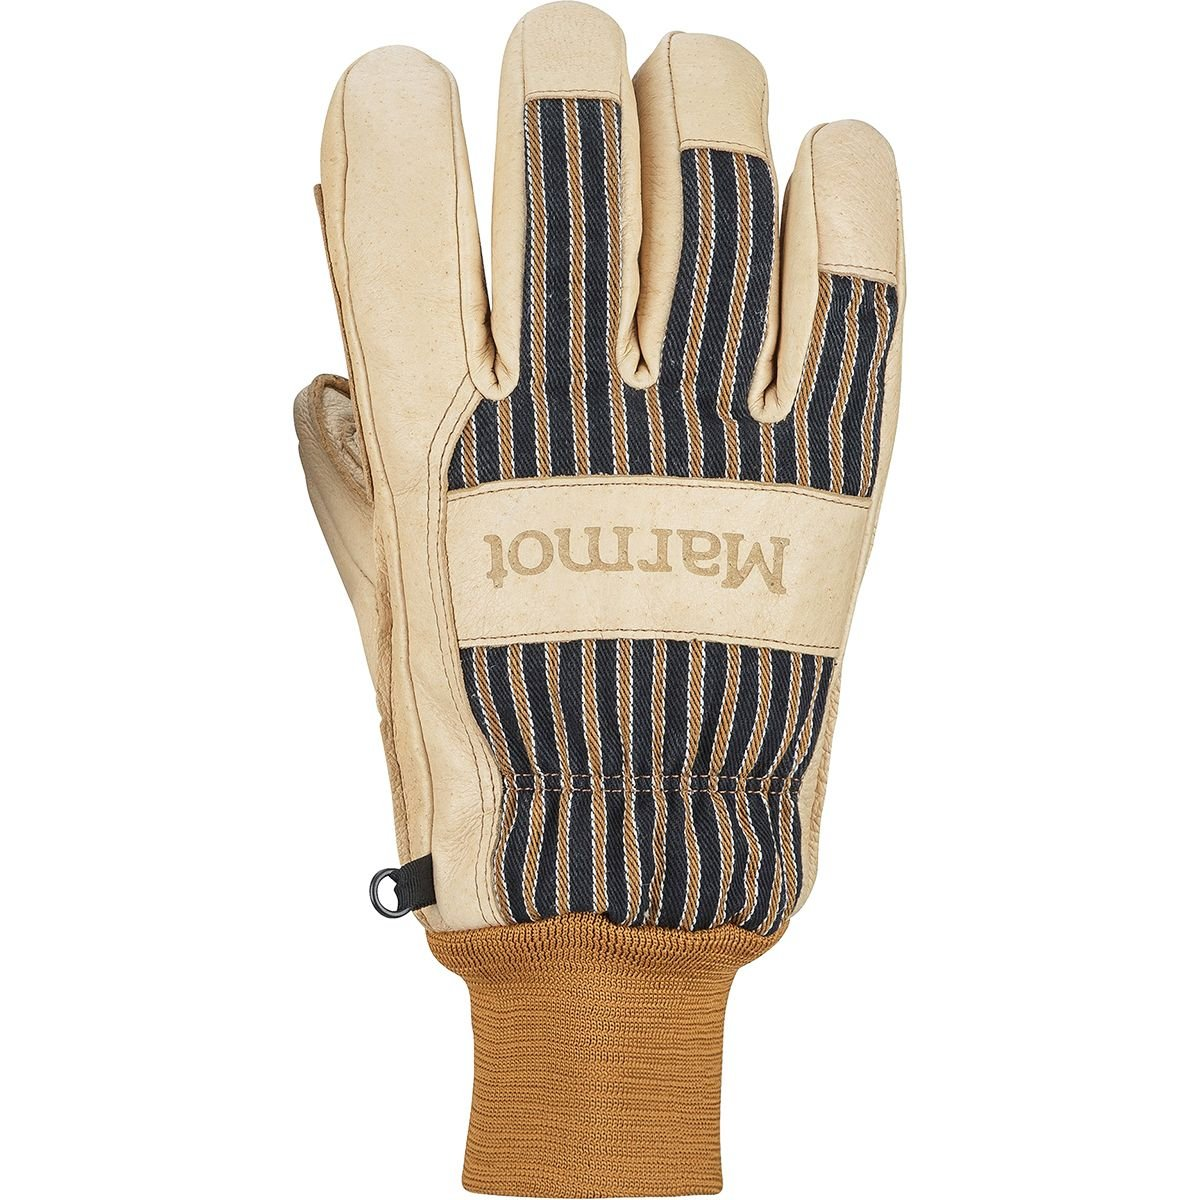 Marmot Lifty Glove - Glove メンズ - タン/ブラウン、M Lifty B07FVZN2PQ, 紙通販ダイゲン:43897e8e --- ijpba.info